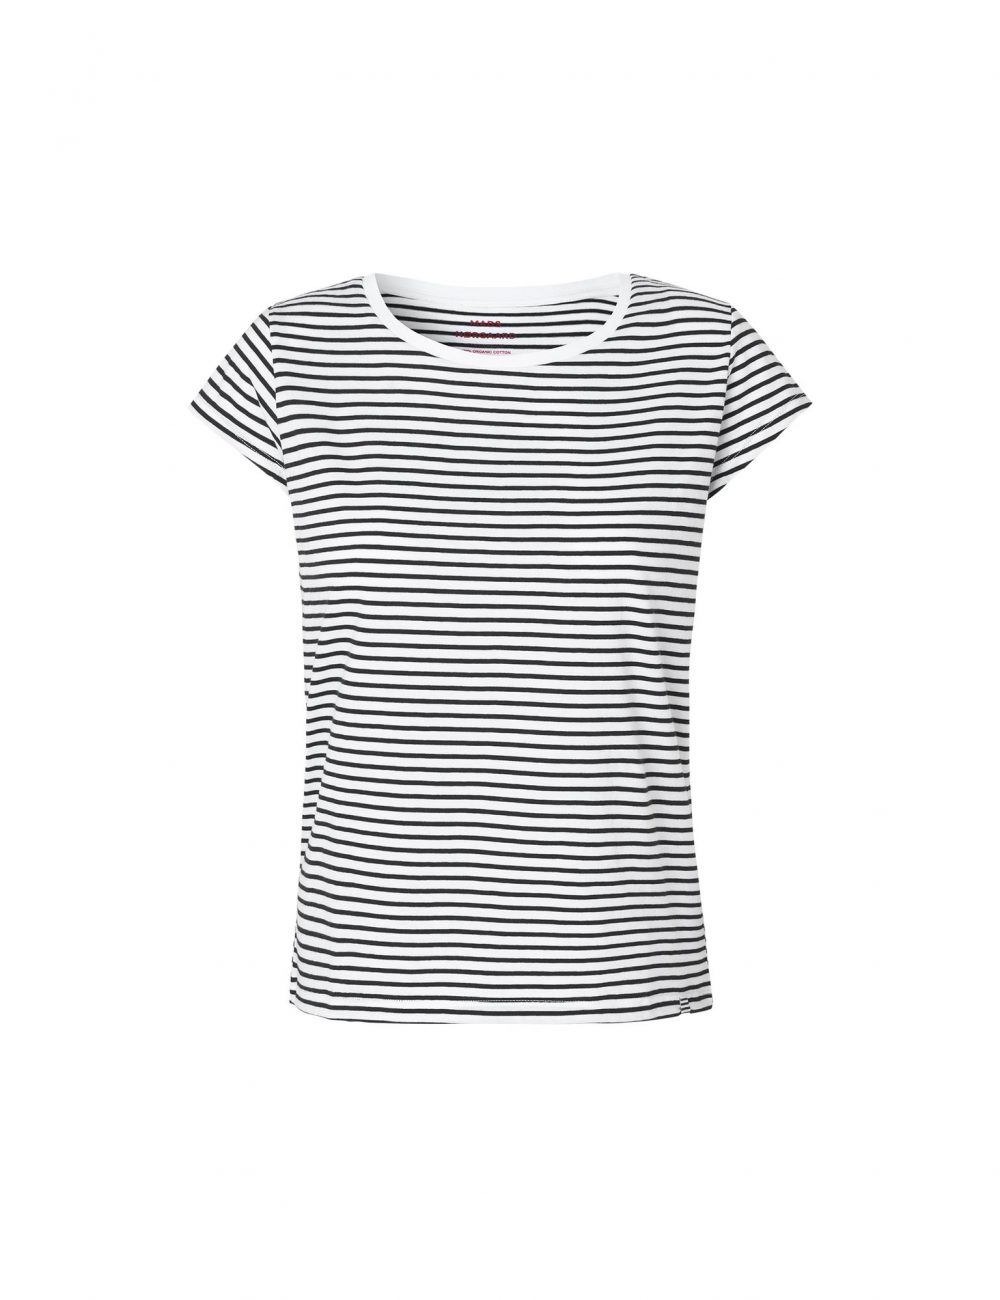 Favorite Stripe Shirt White/Black